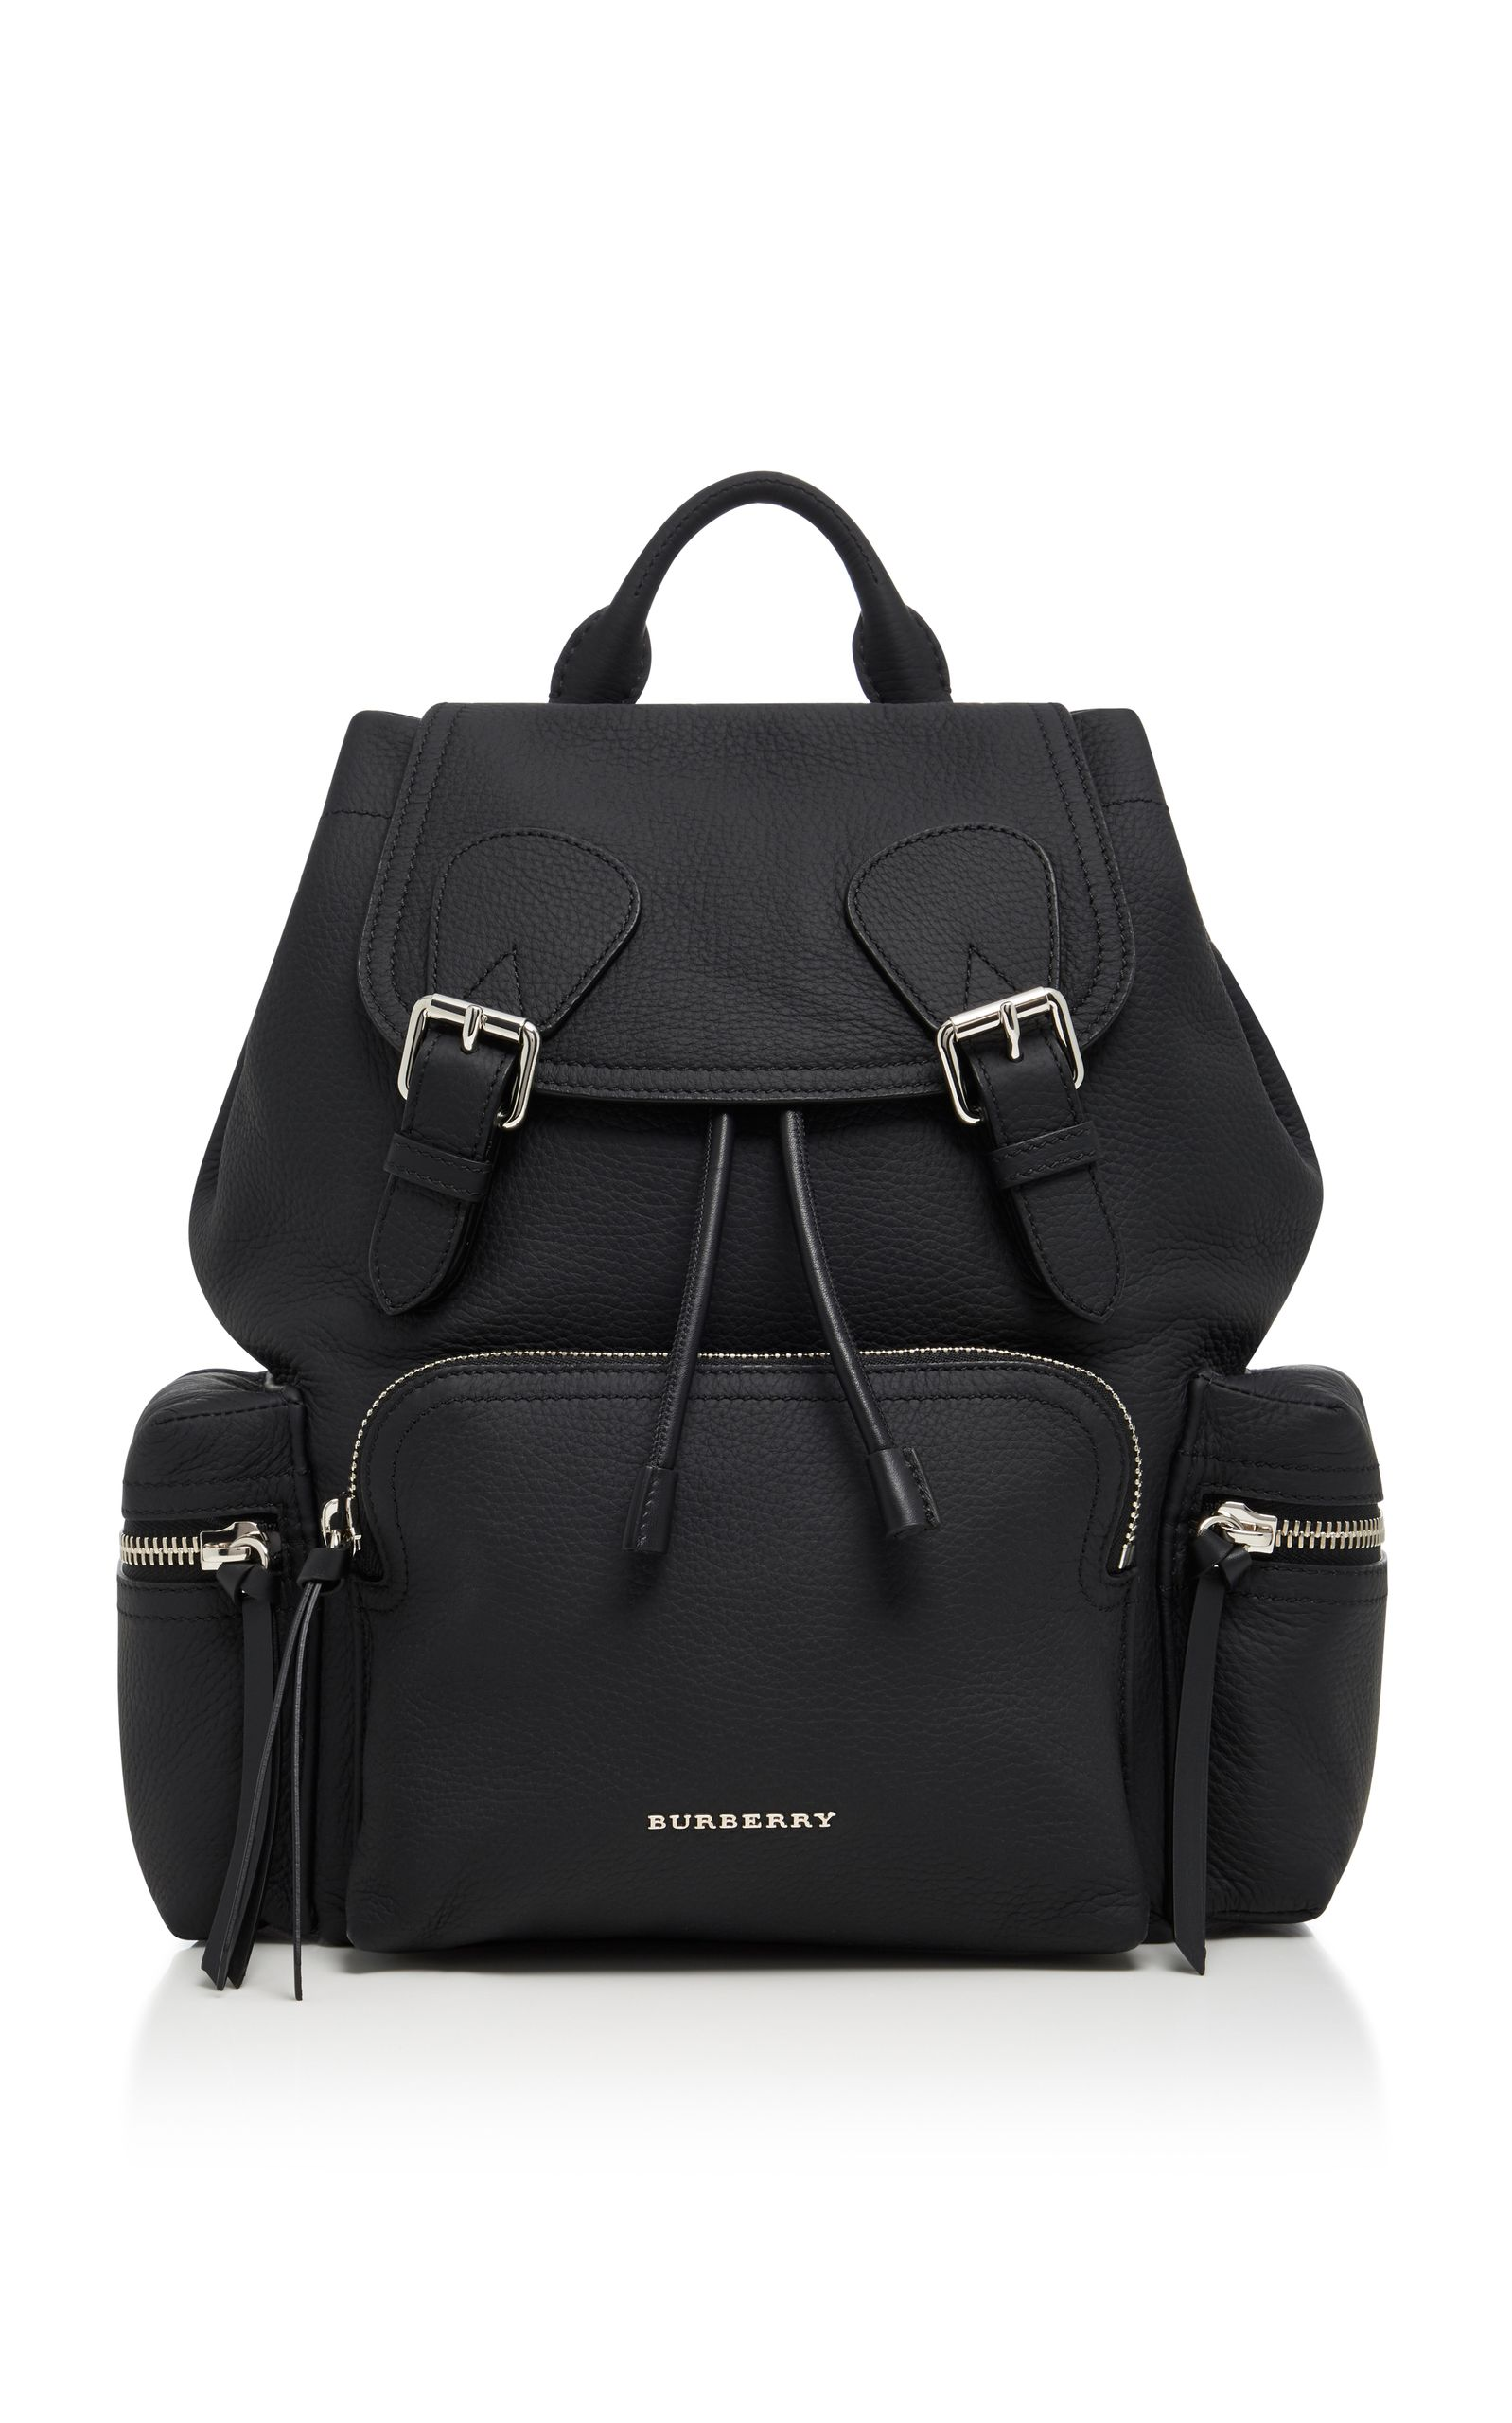 Burberry Fox Handbag